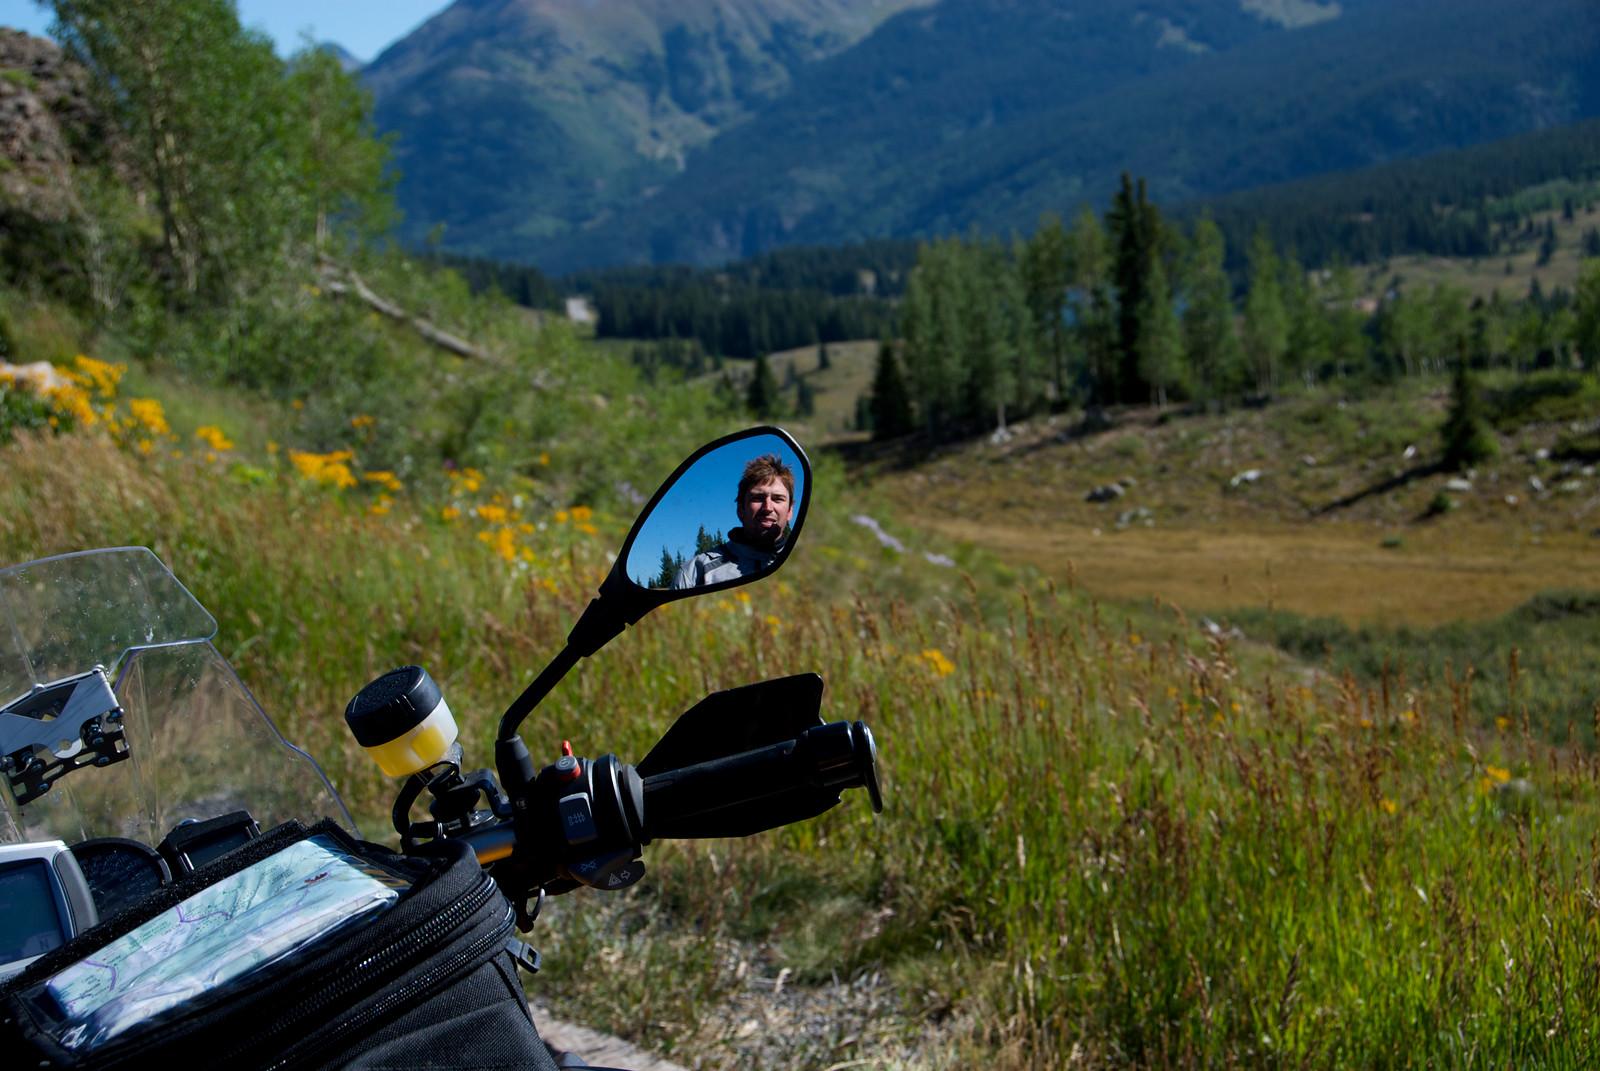 BTL 0642 - b-lec - Mountain Biking Pictures - Vital MTB